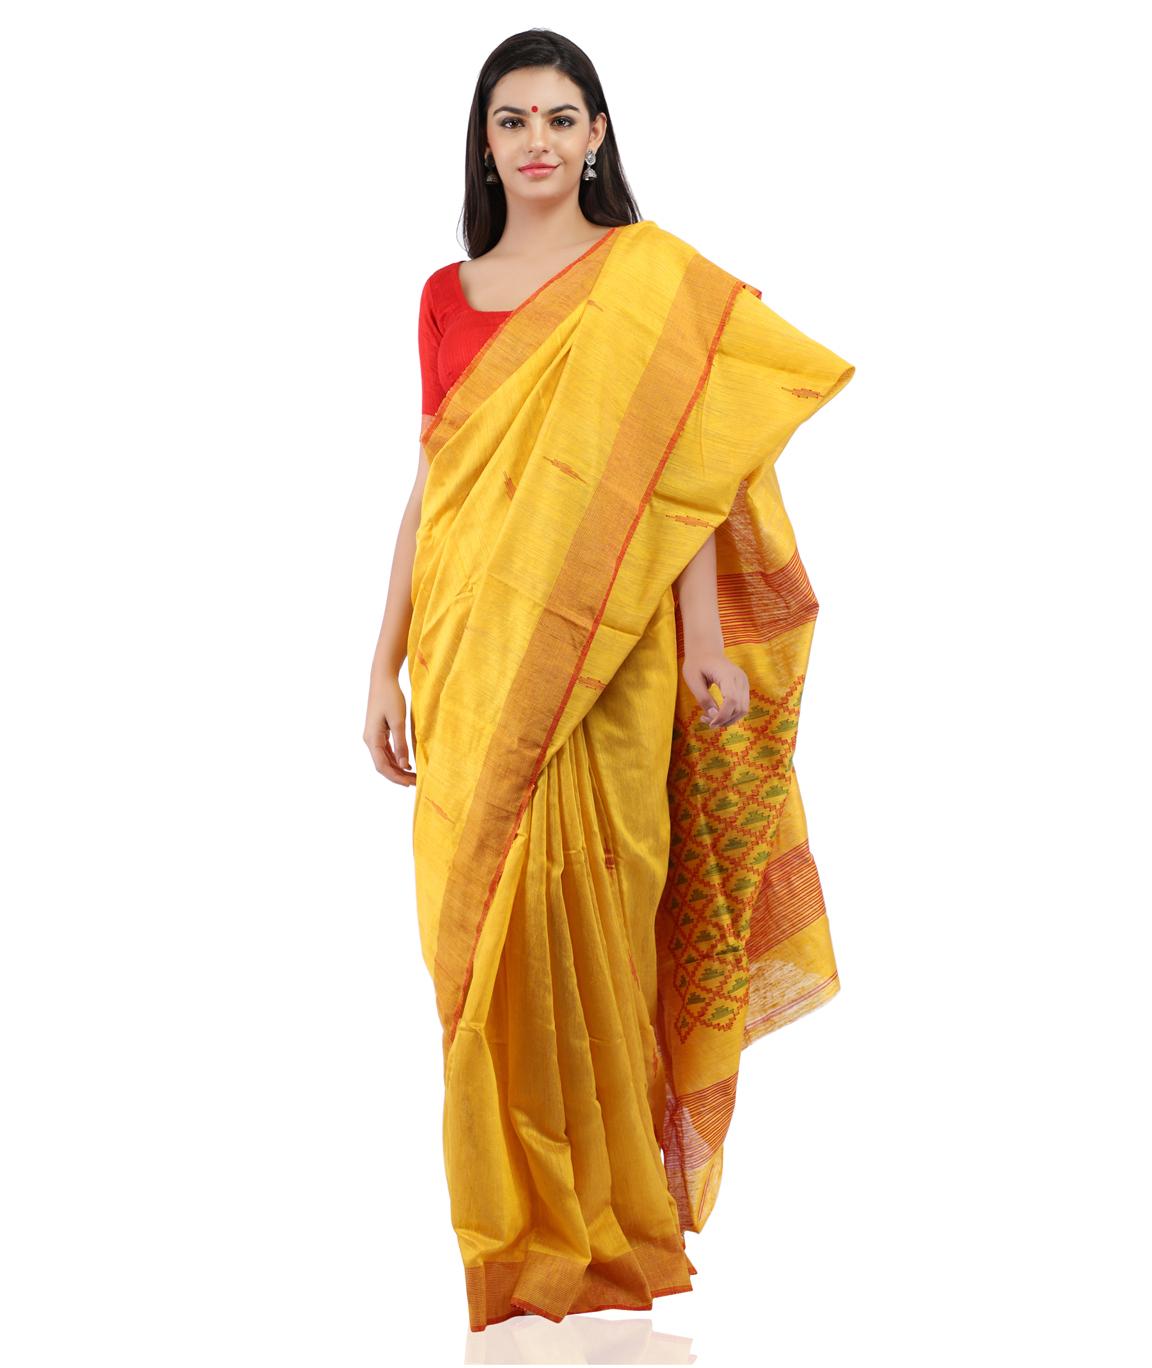 Handloom Pure Matka Silk Jamdani Saree in Mustard Yellow With Blouse Piece